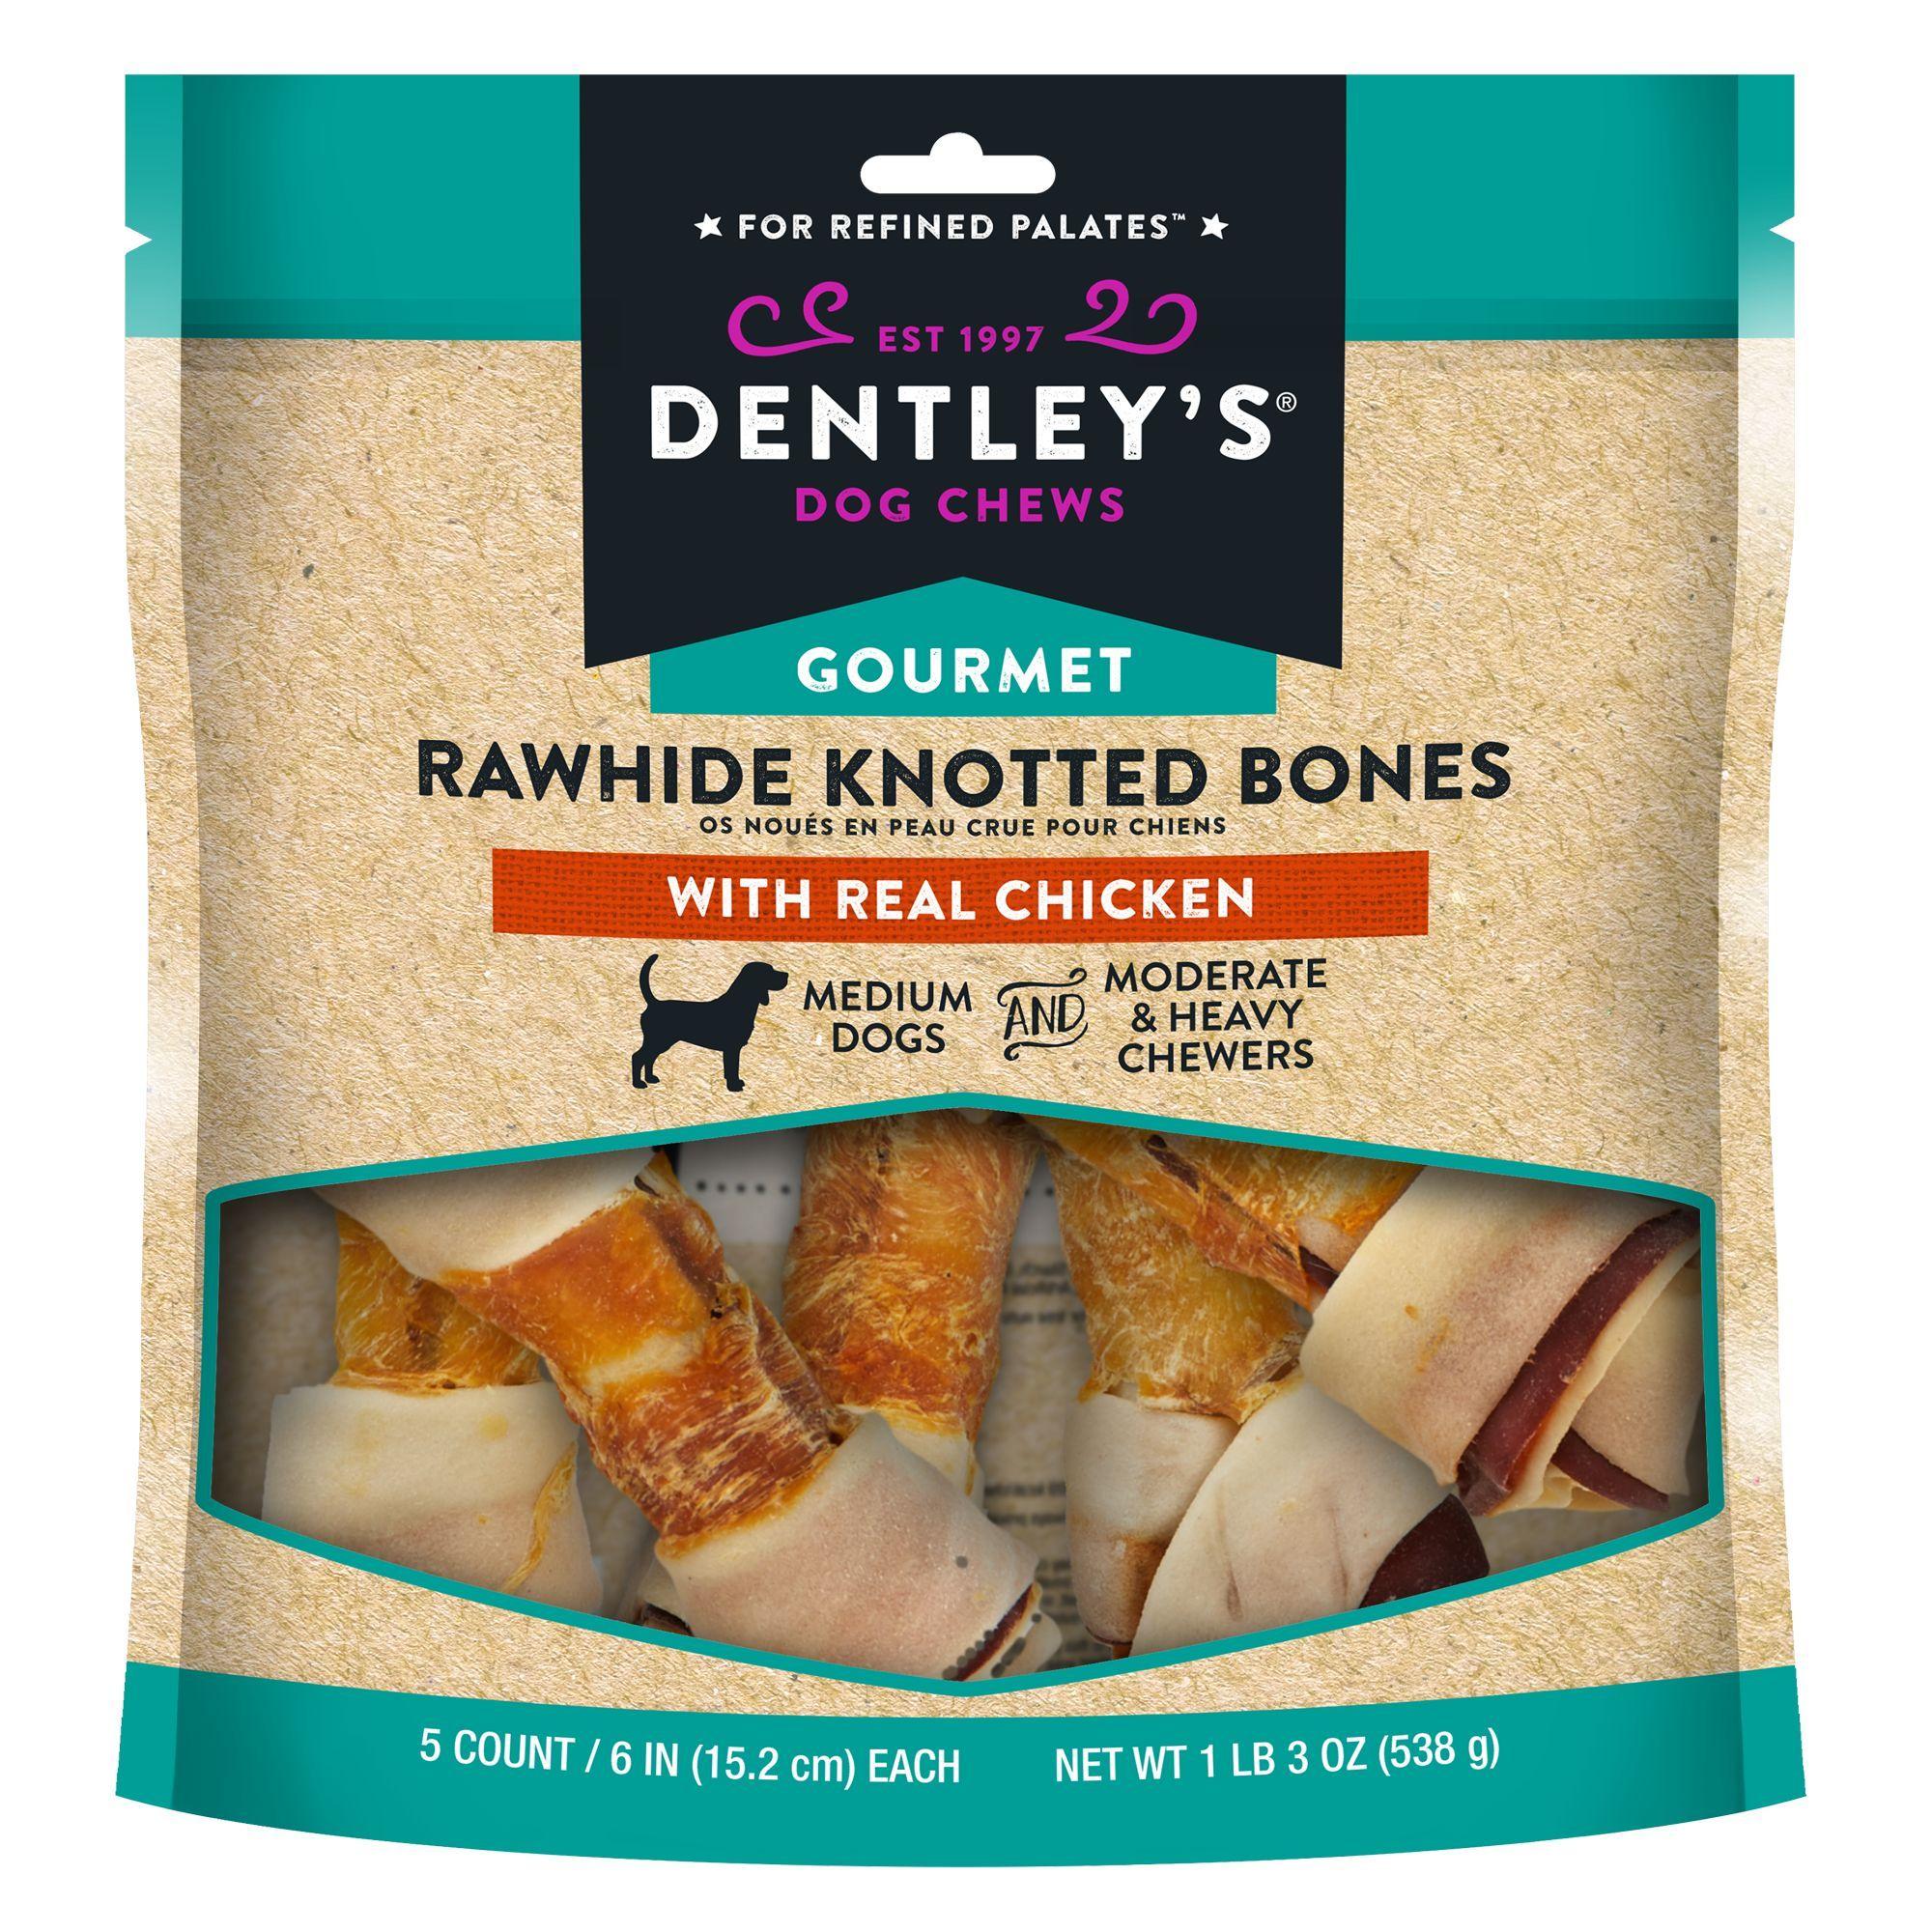 Dentley S Gourmet Rawhide Knotted Bones Dog Treats Chicken